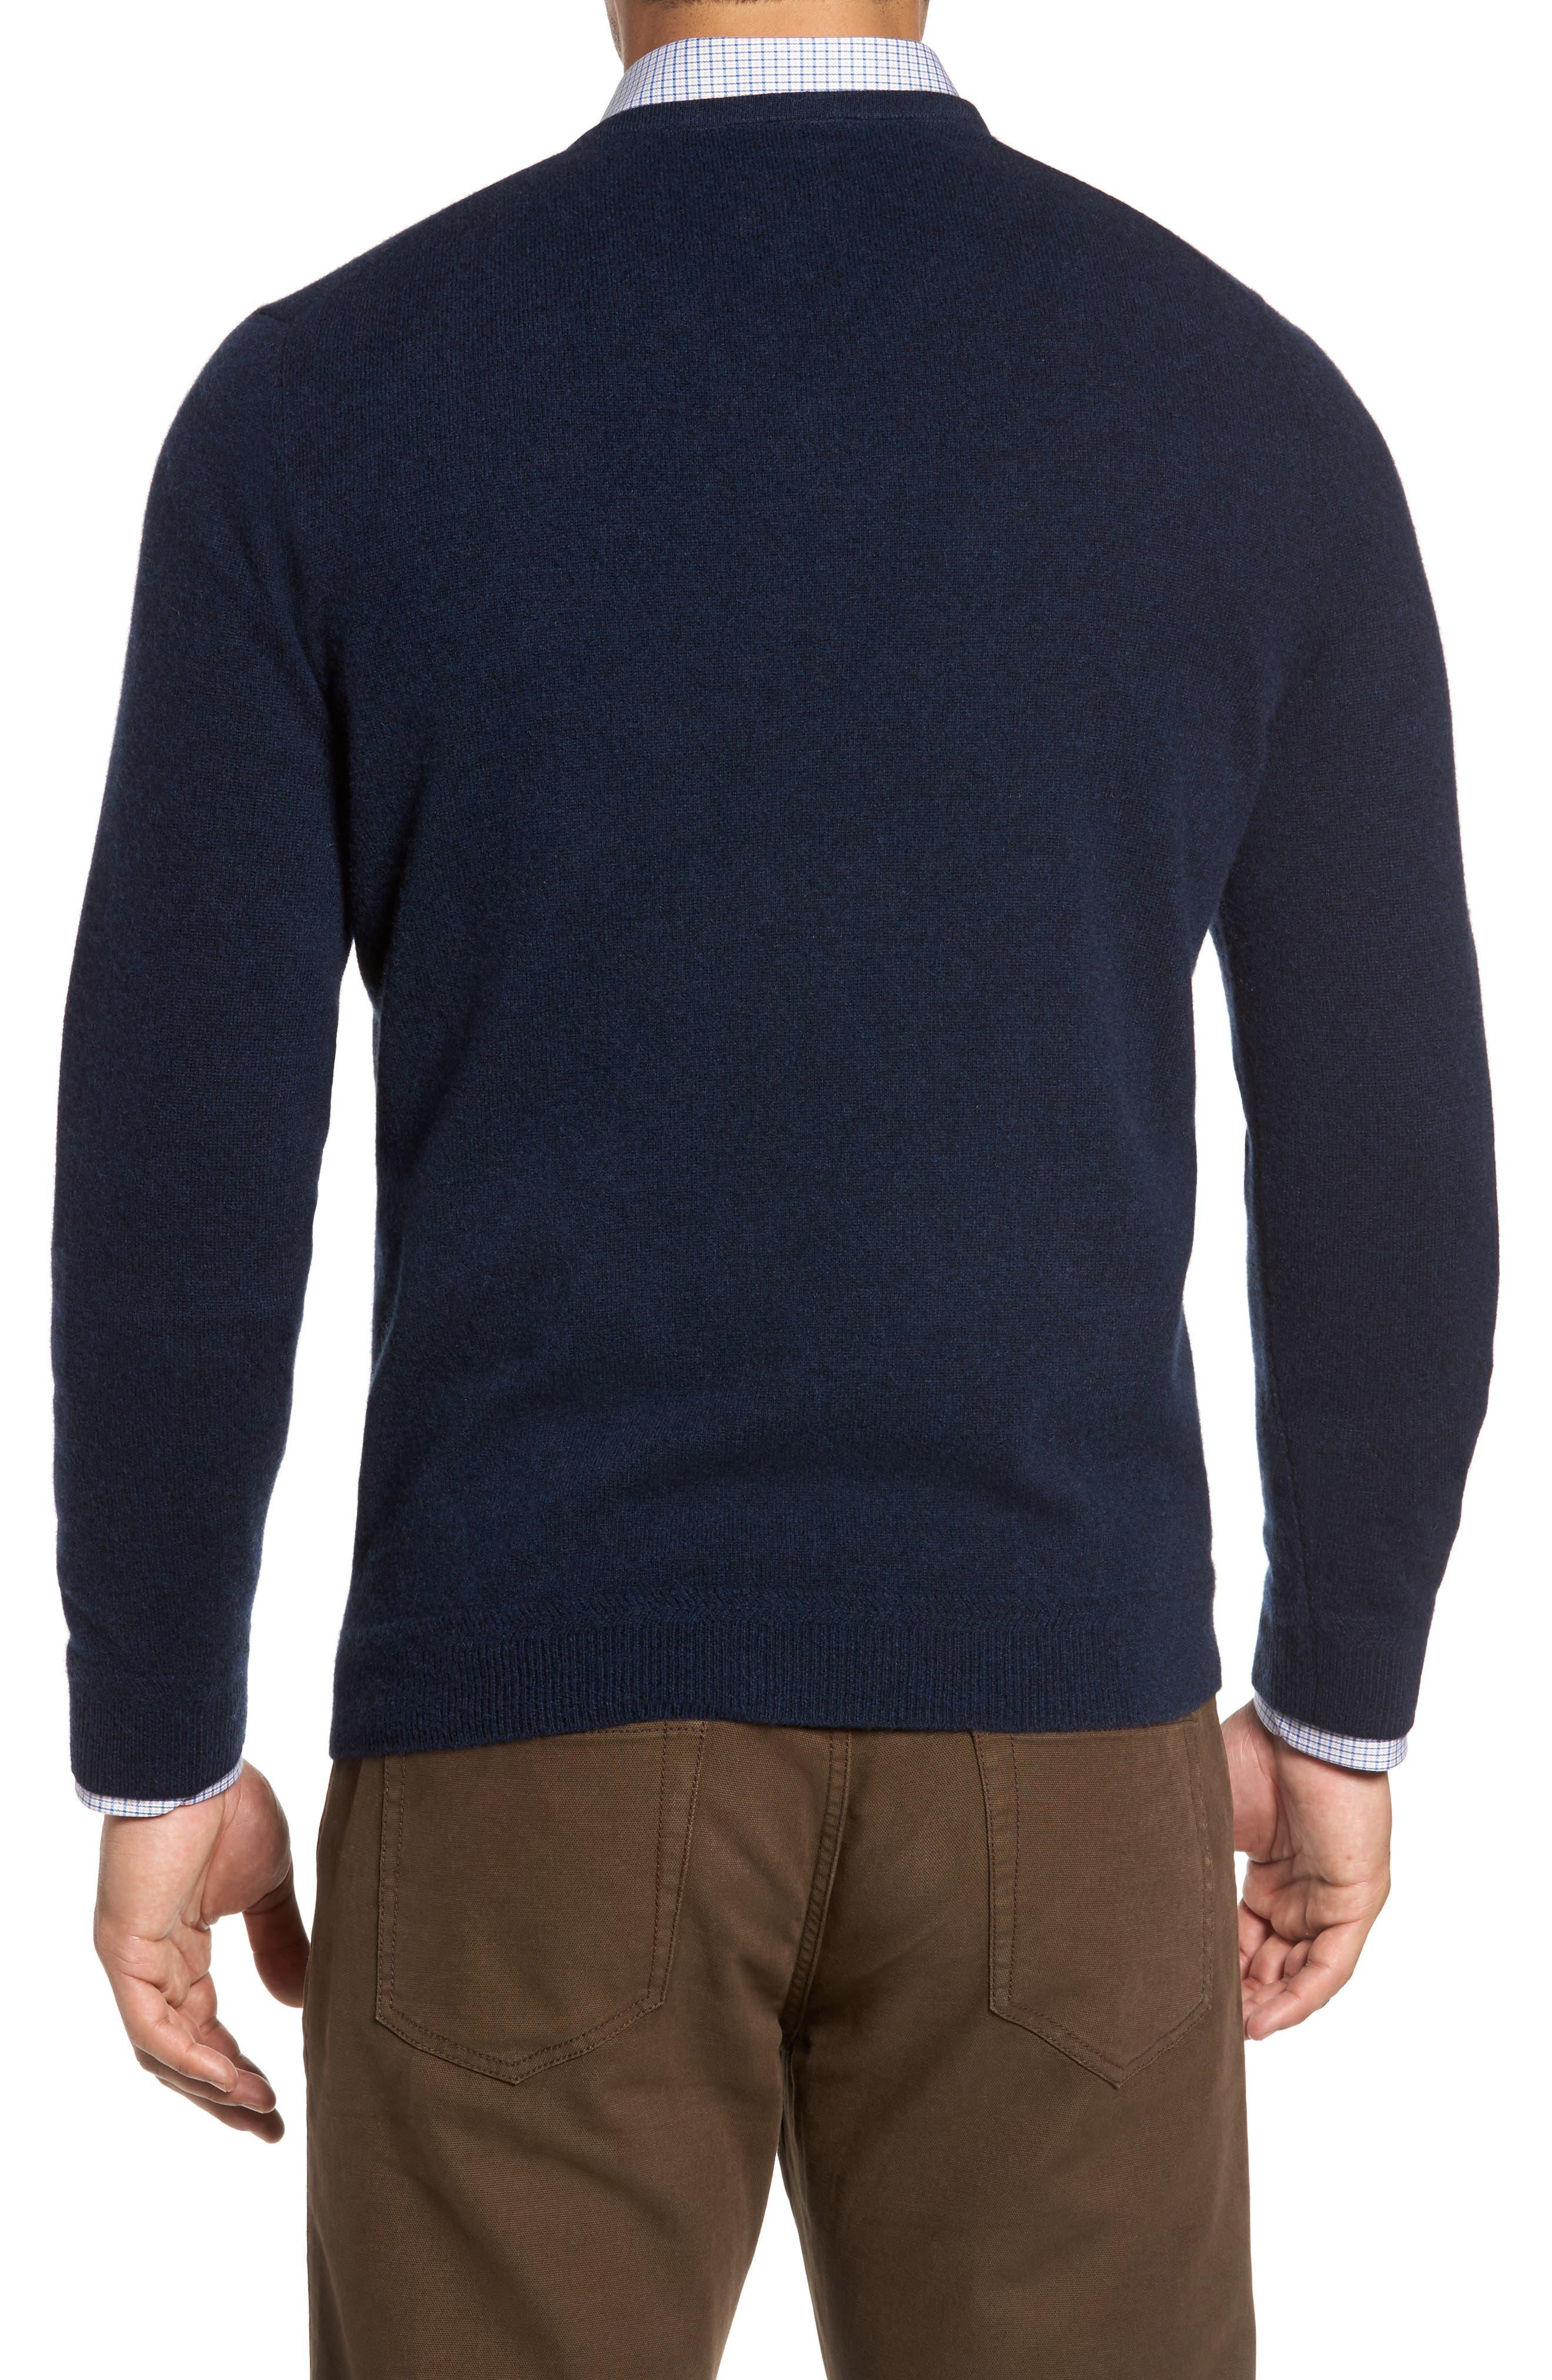 John W. Nordstrom Cashmere V-Neck Sweater,                             Alternate thumbnail 3, color,                             BLUE ESTATE HEATHER